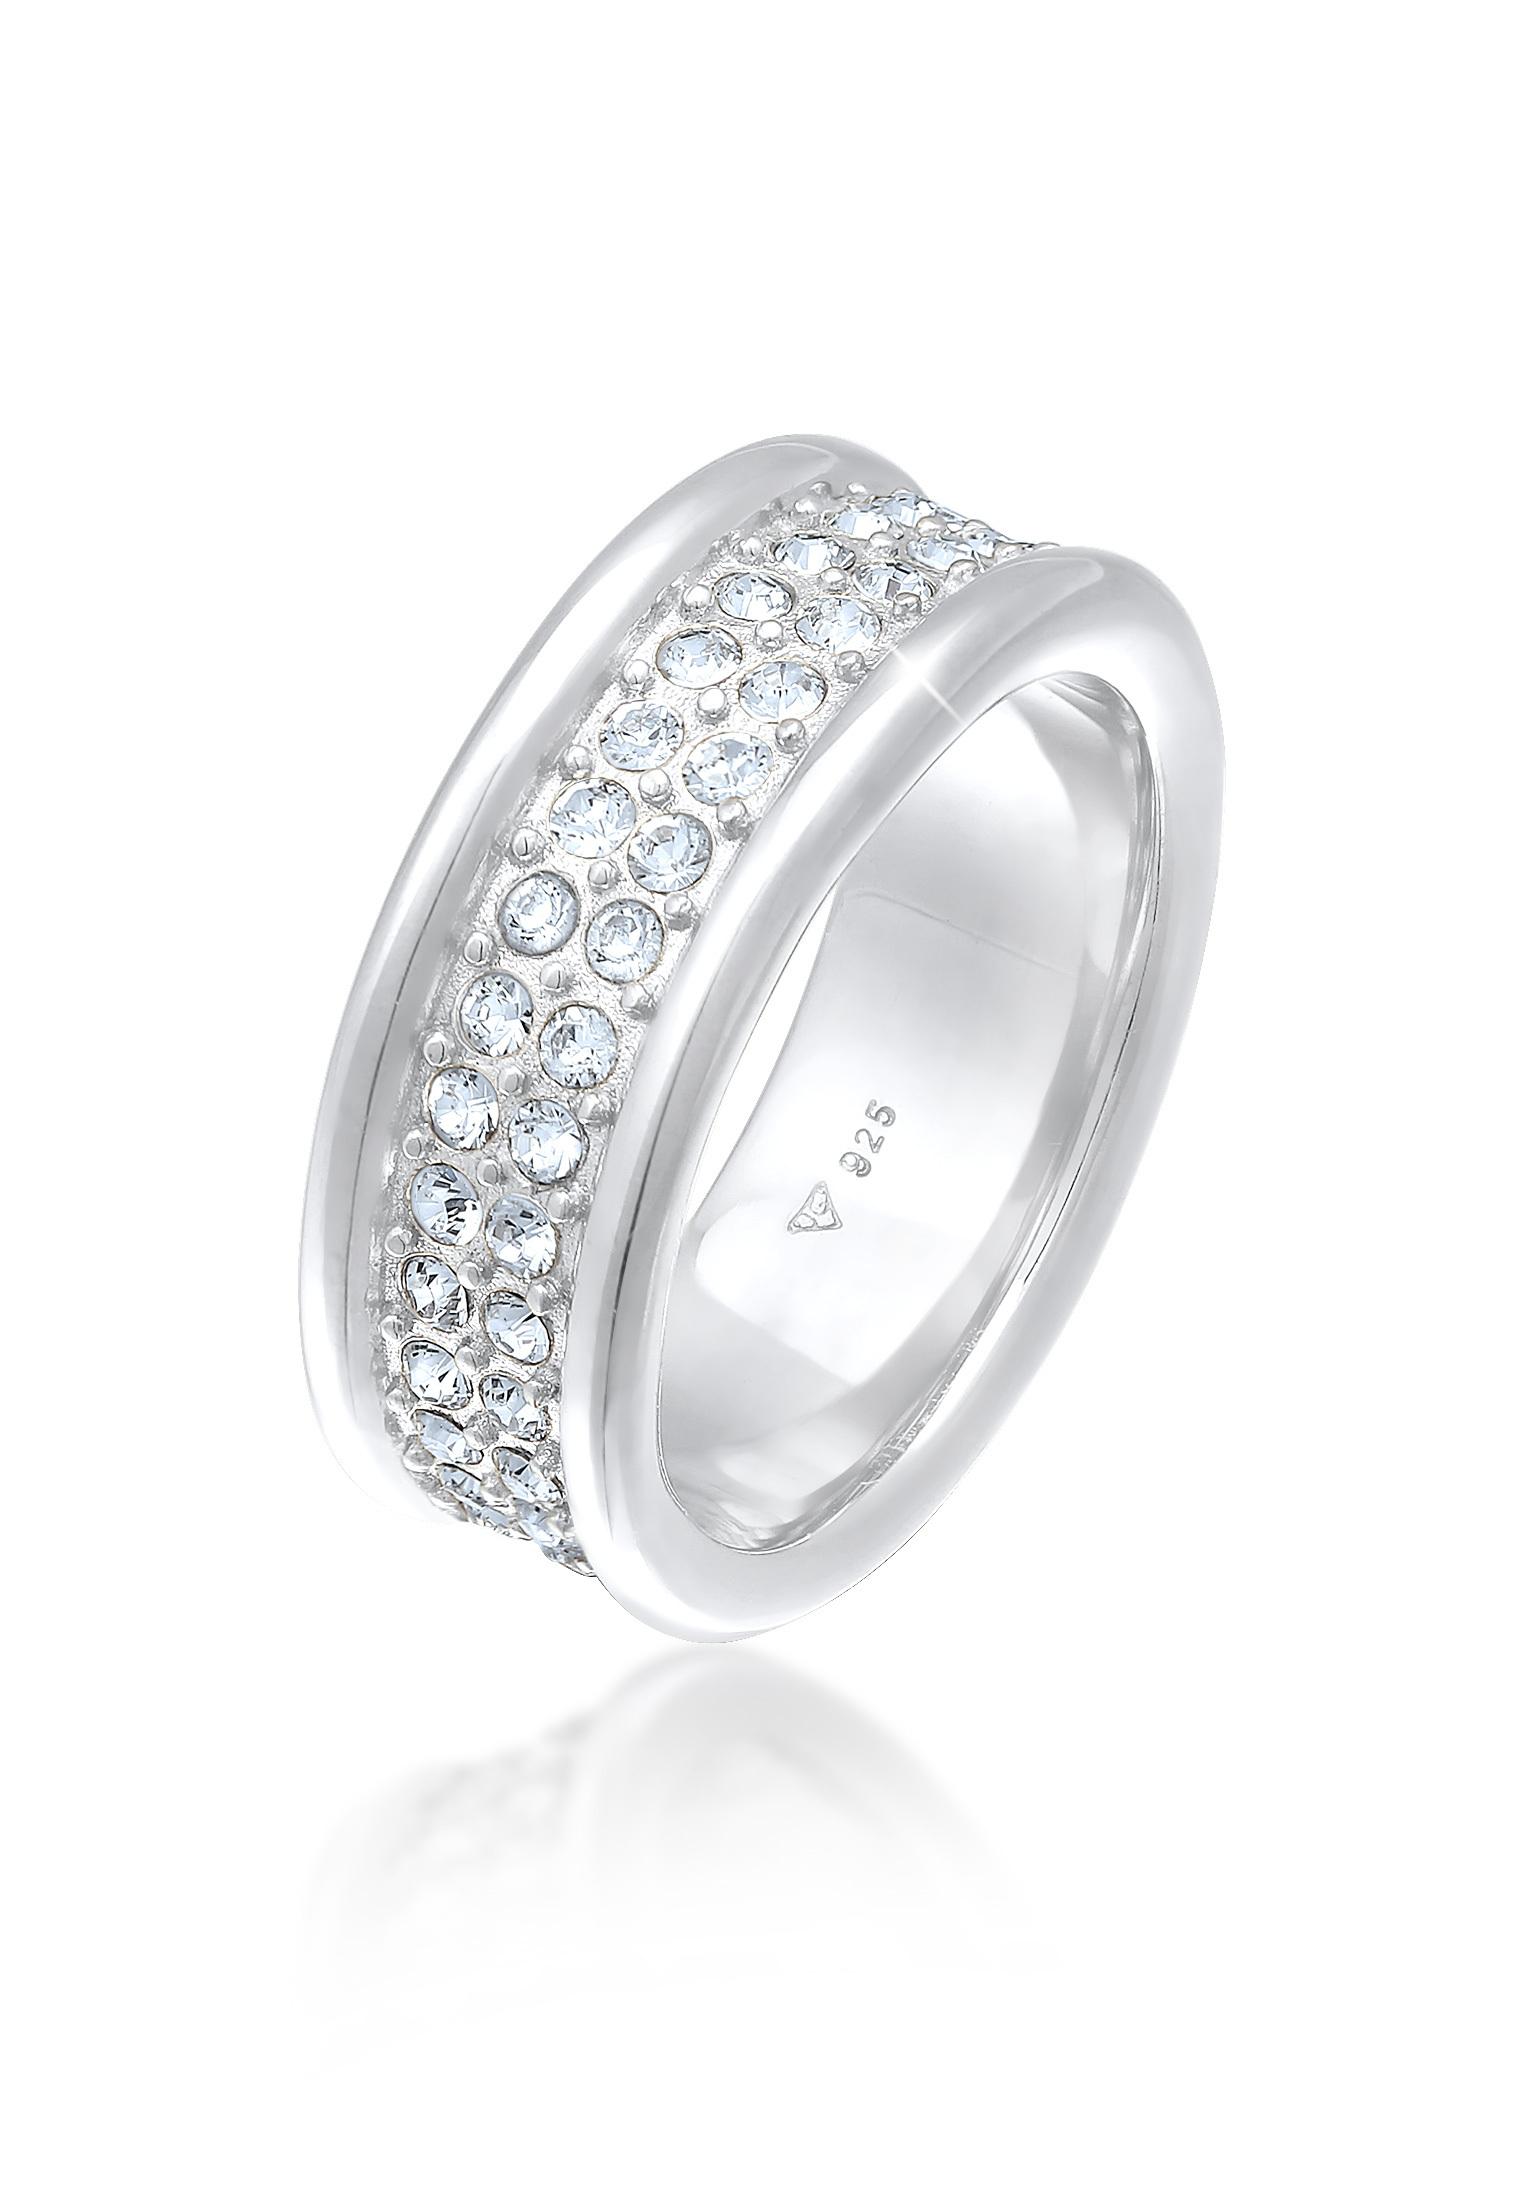 Bandring | Kristalle (weiß) | 925er Sterling Silber